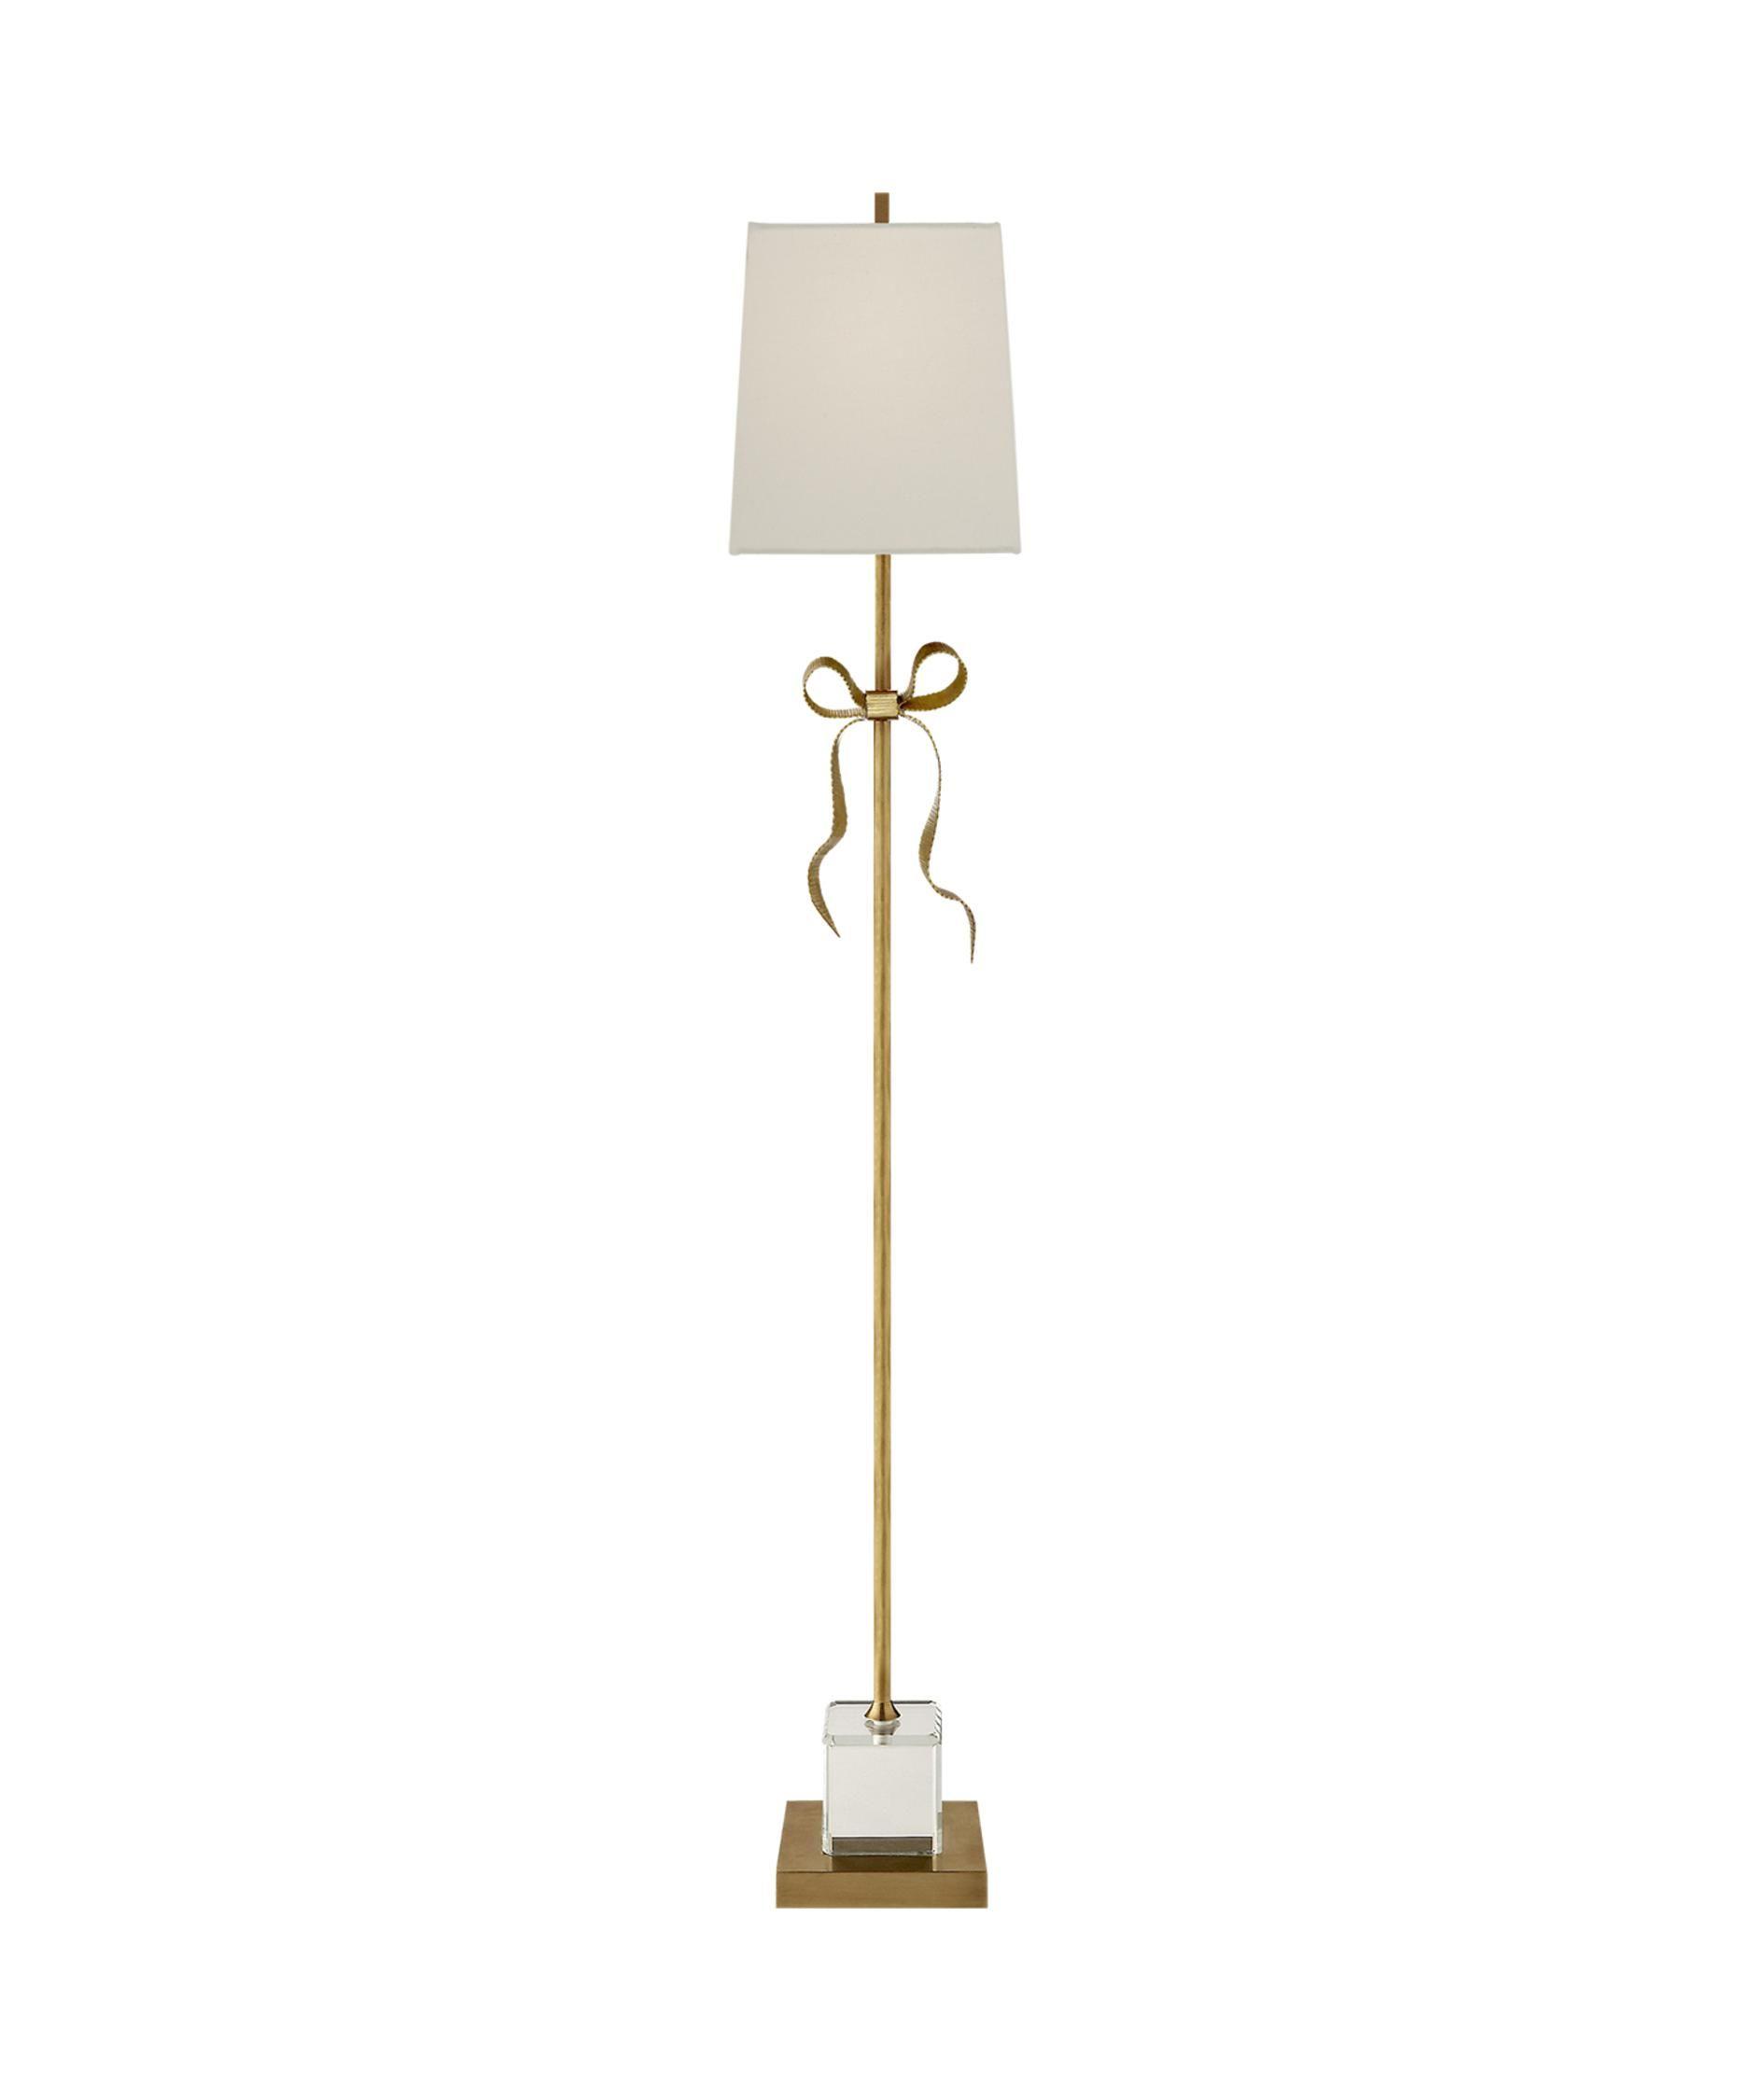 Visual Comfort Ks1201 Kate Spade Ellery 56 Inch High Floor Lamp